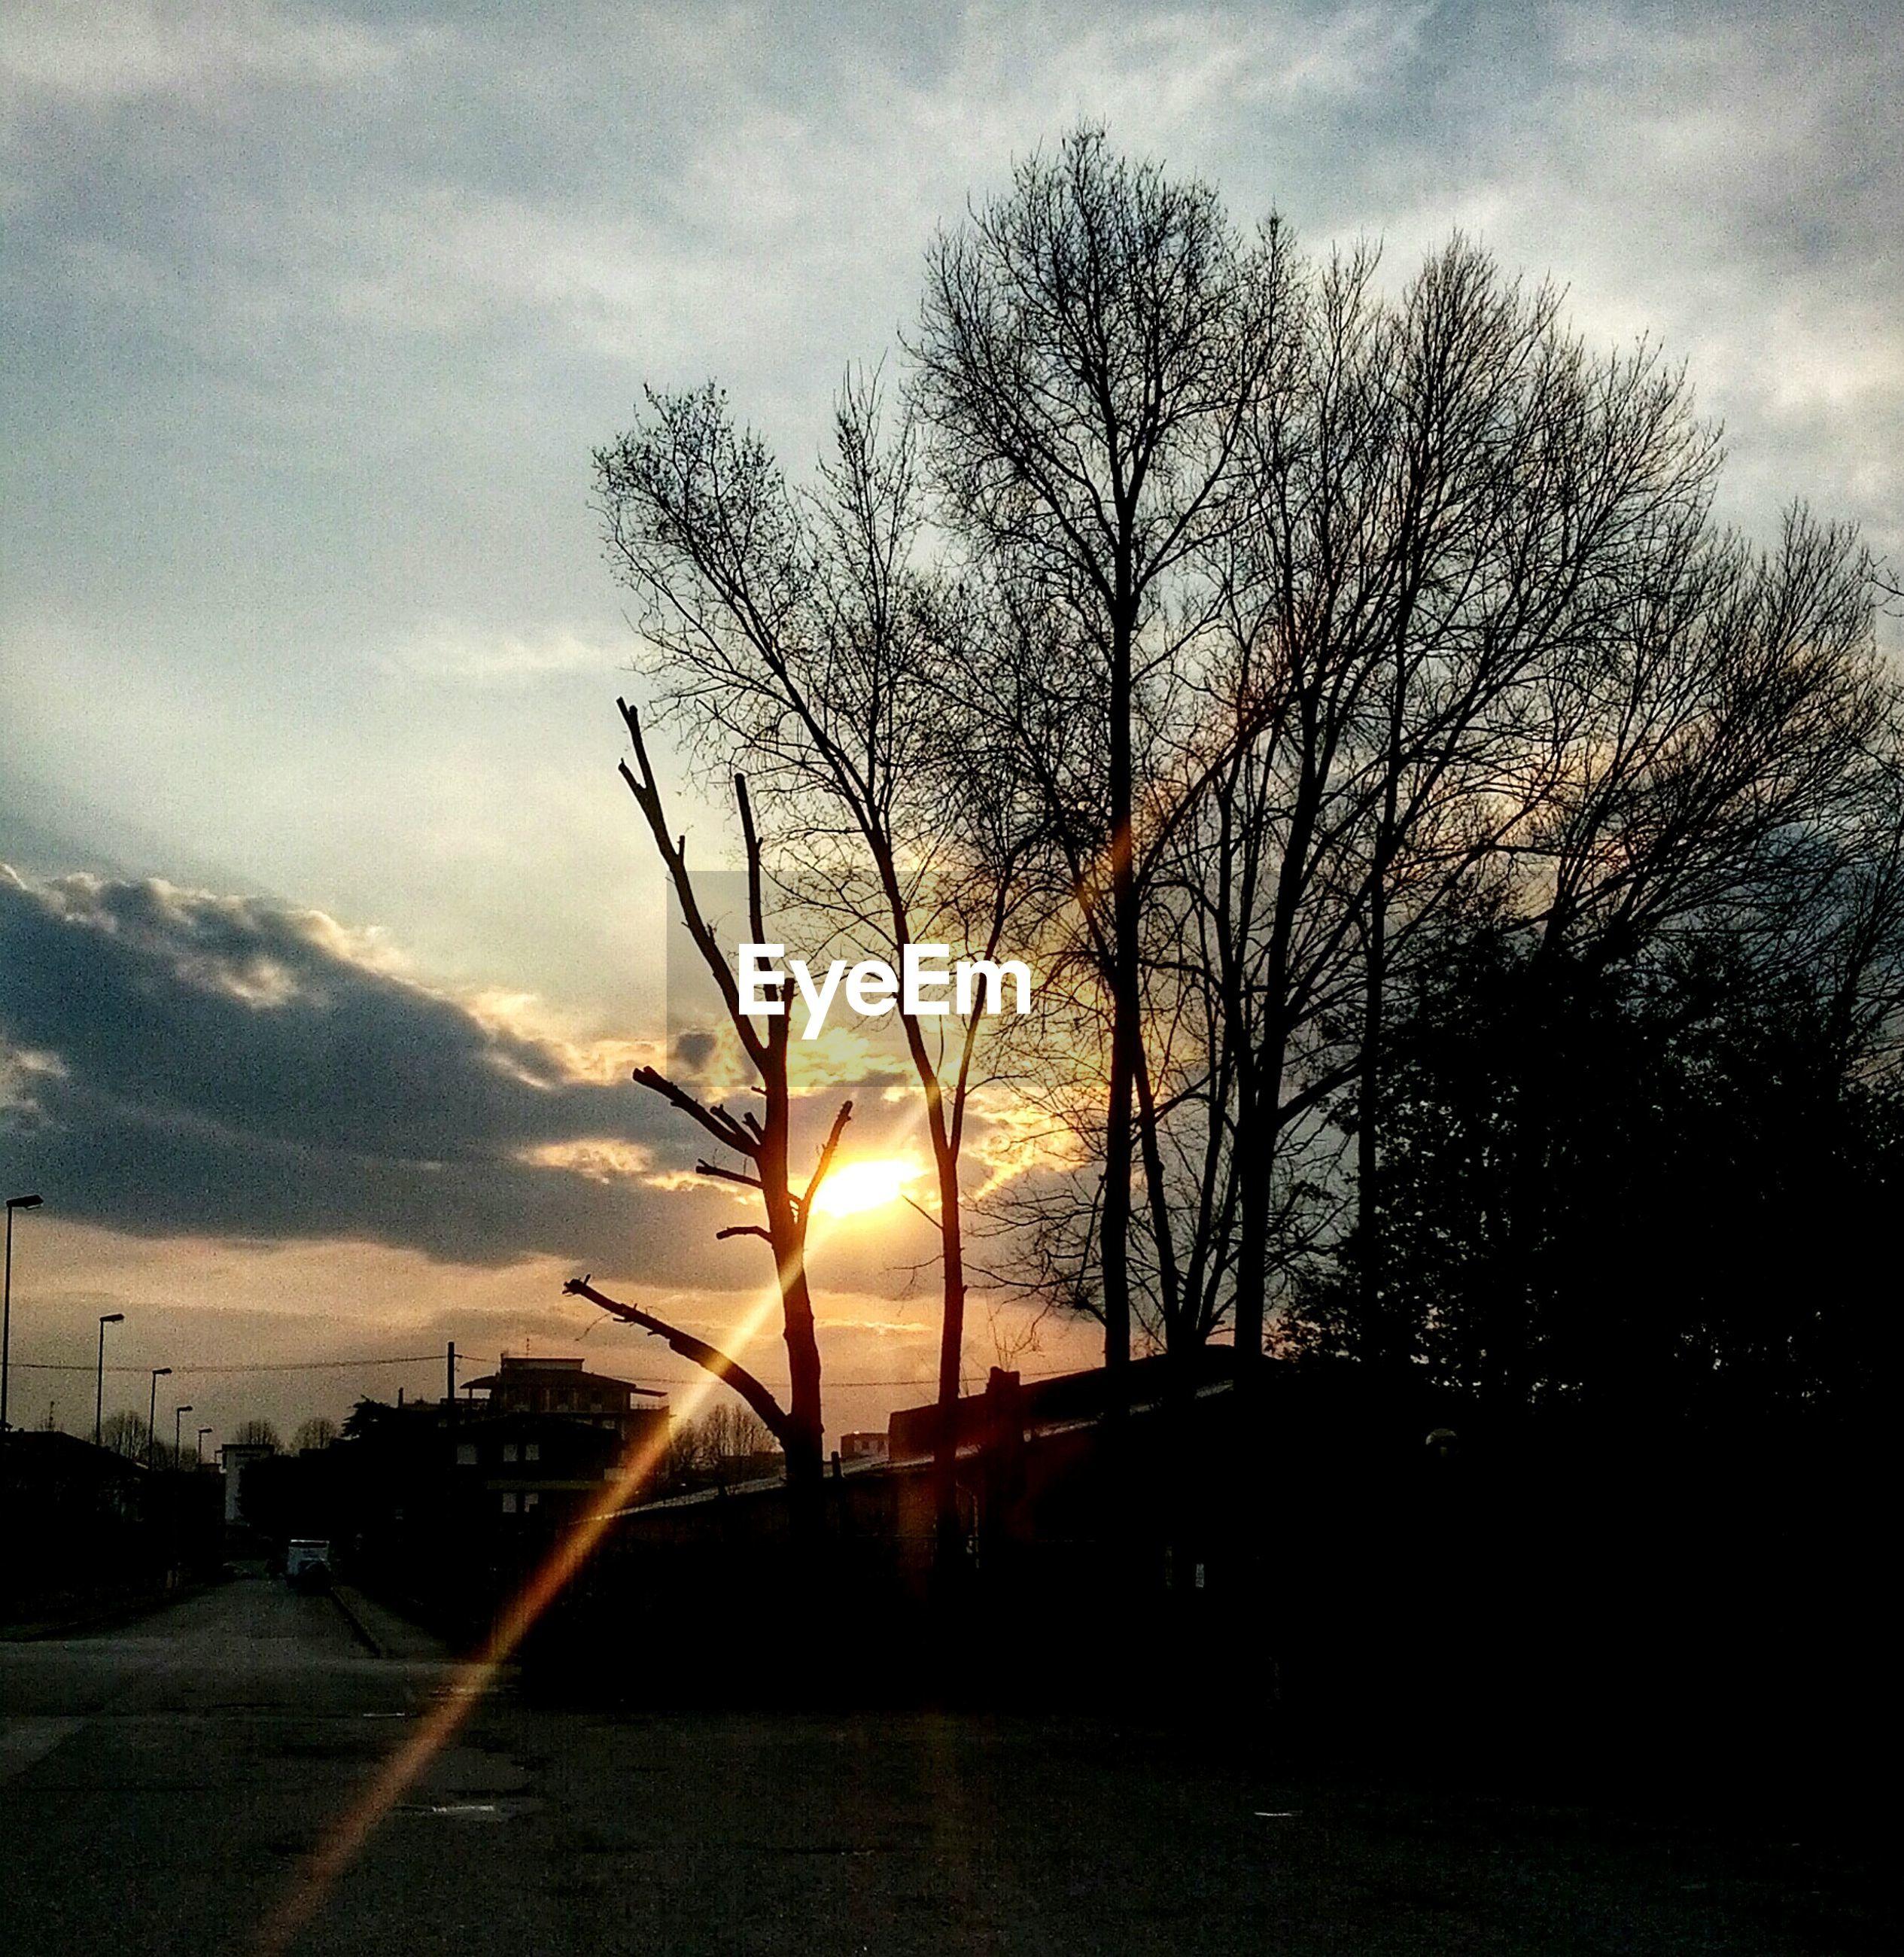 tree, sun, sunset, silhouette, sky, bare tree, sunlight, sunbeam, cloud - sky, tranquility, branch, road, lens flare, tranquil scene, nature, back lit, scenics, beauty in nature, cloud, transportation